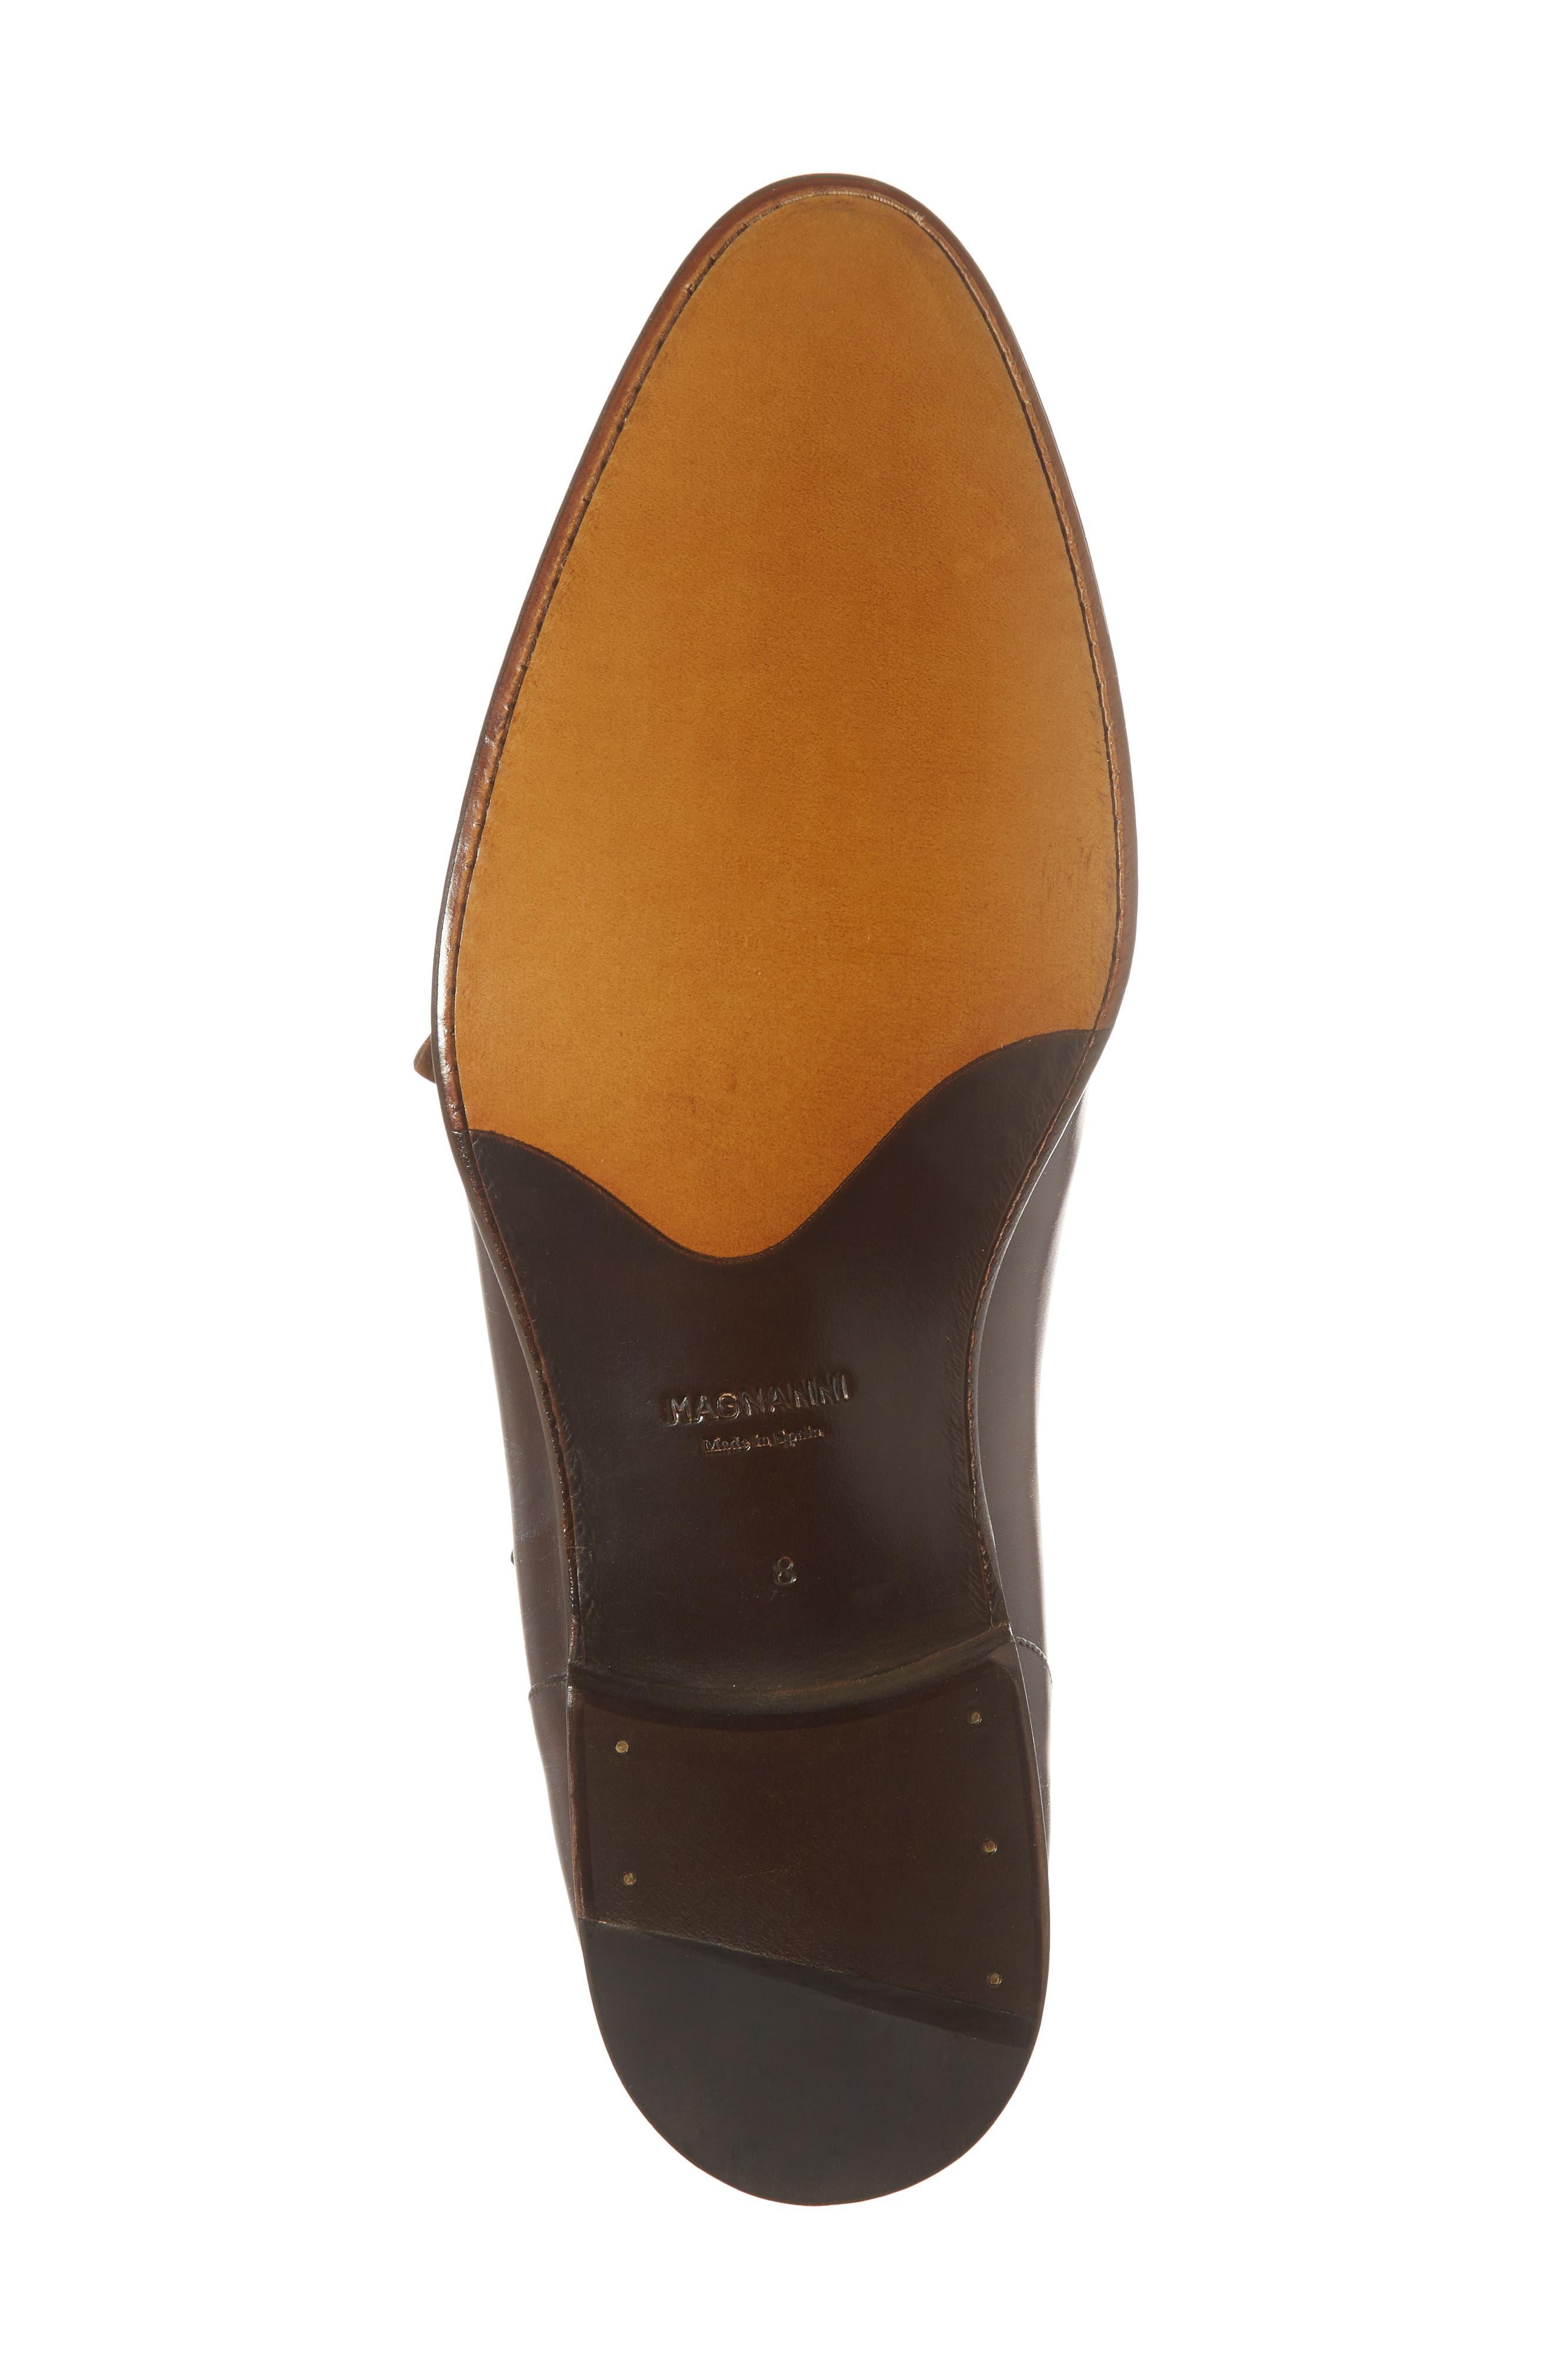 Pratt Double Strap Monk Shoe,                             Alternate thumbnail 6, color,                             Tabaco Leather